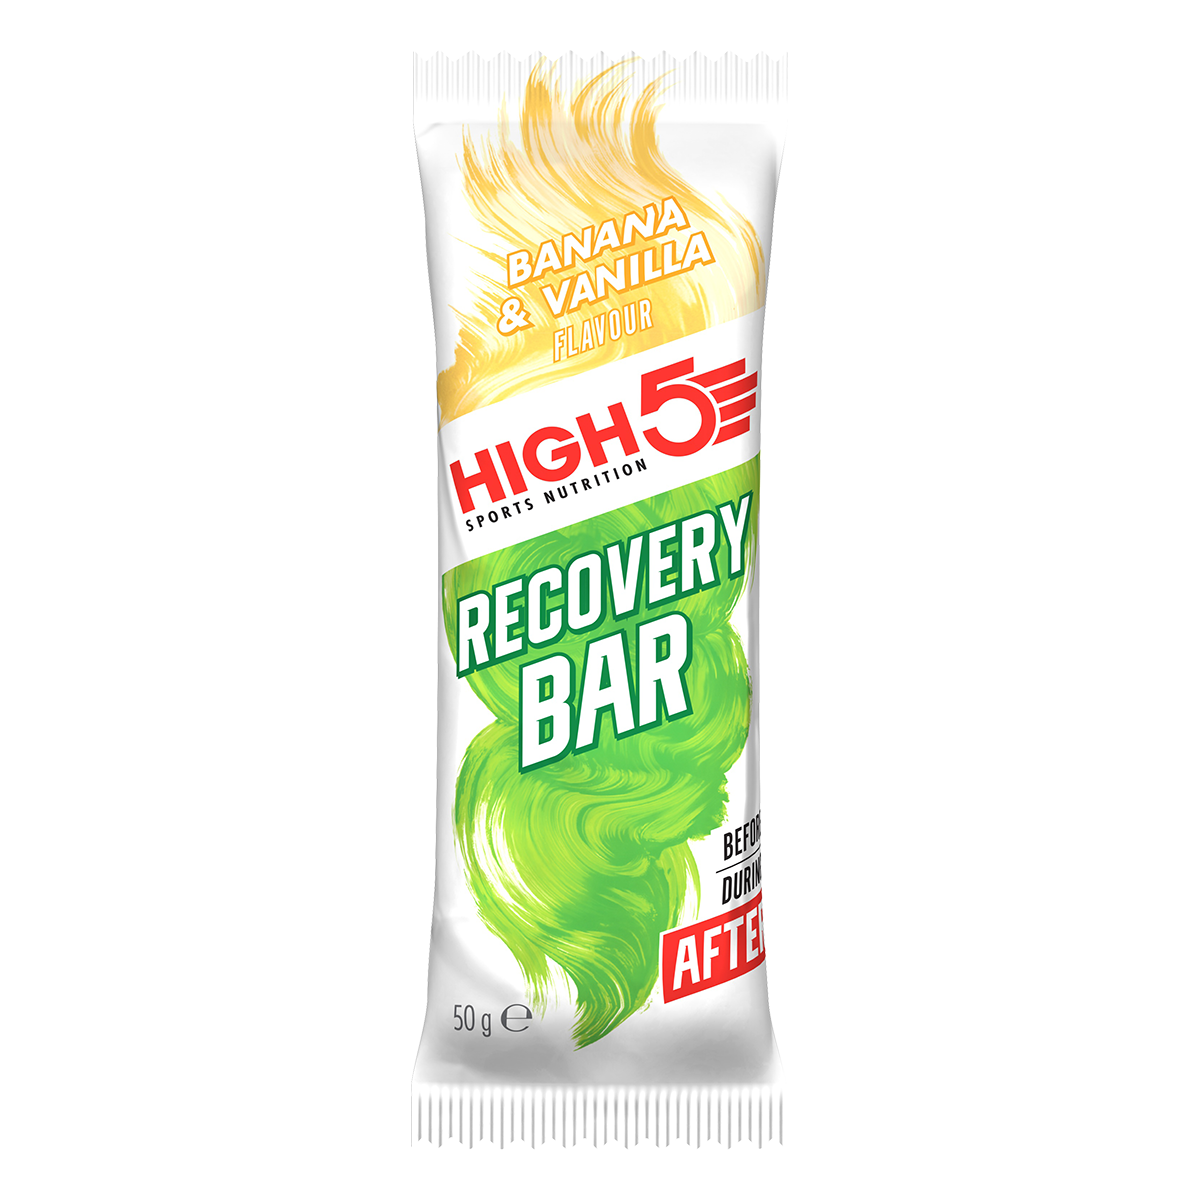 Recovery-Bar_Banana-&-Vanilla_50g_Front_RGB_1200x1200